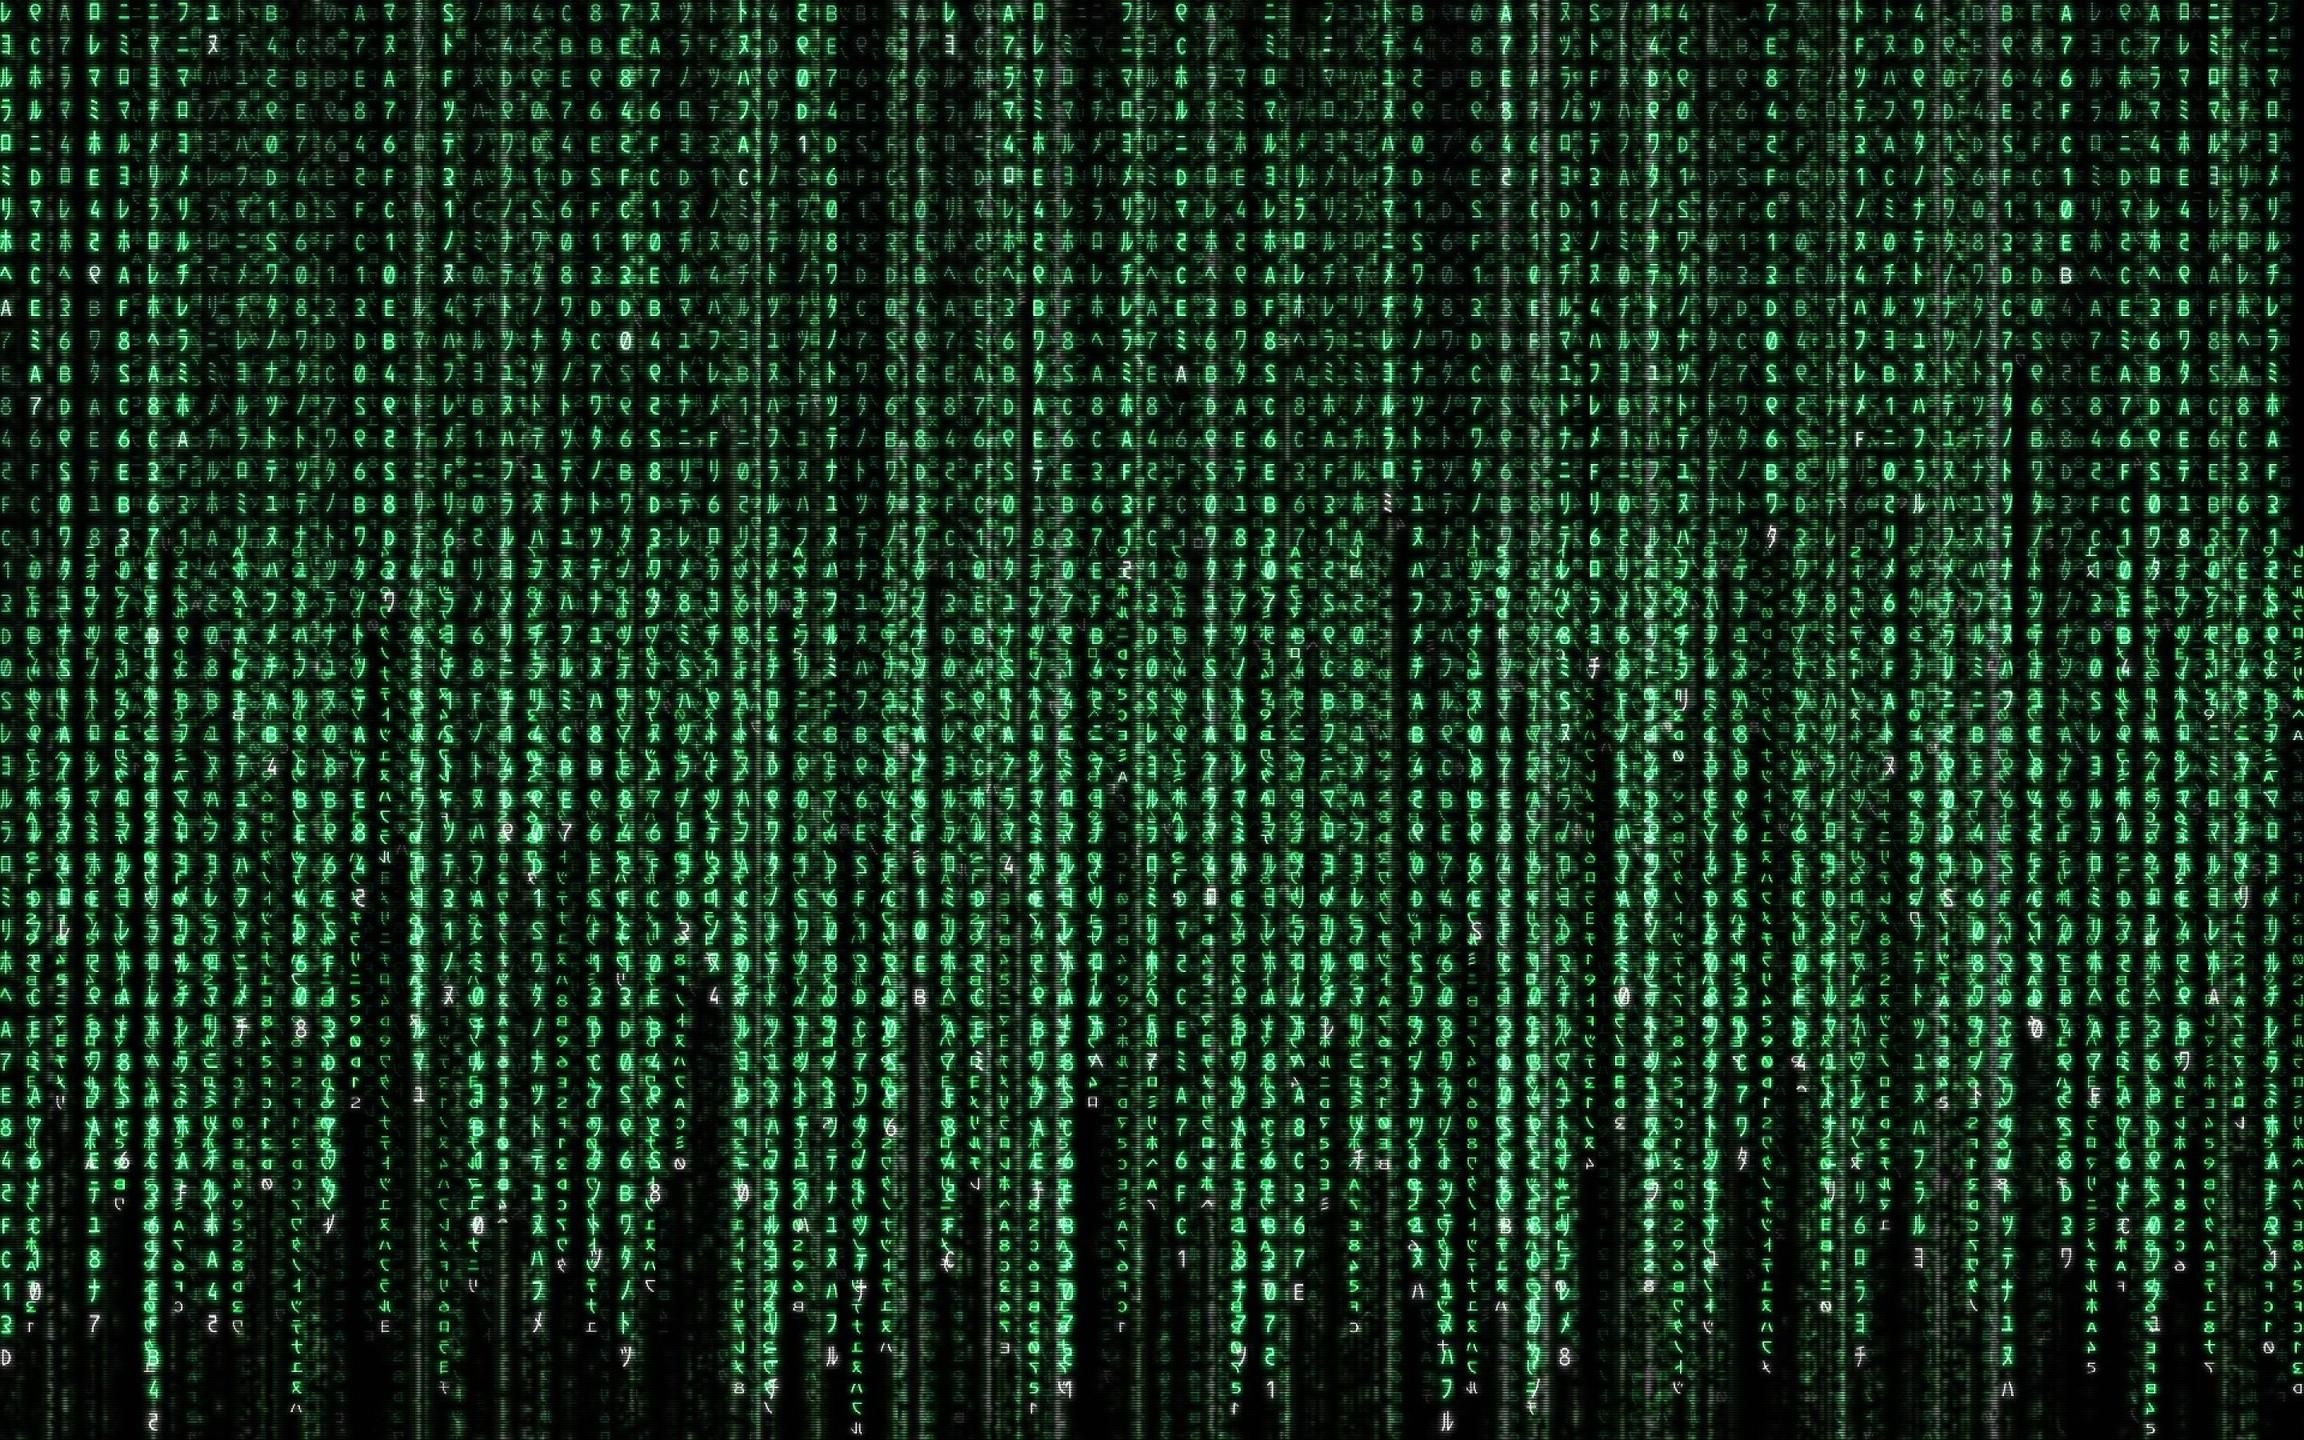 fond d'ecran anime matrix gratuit